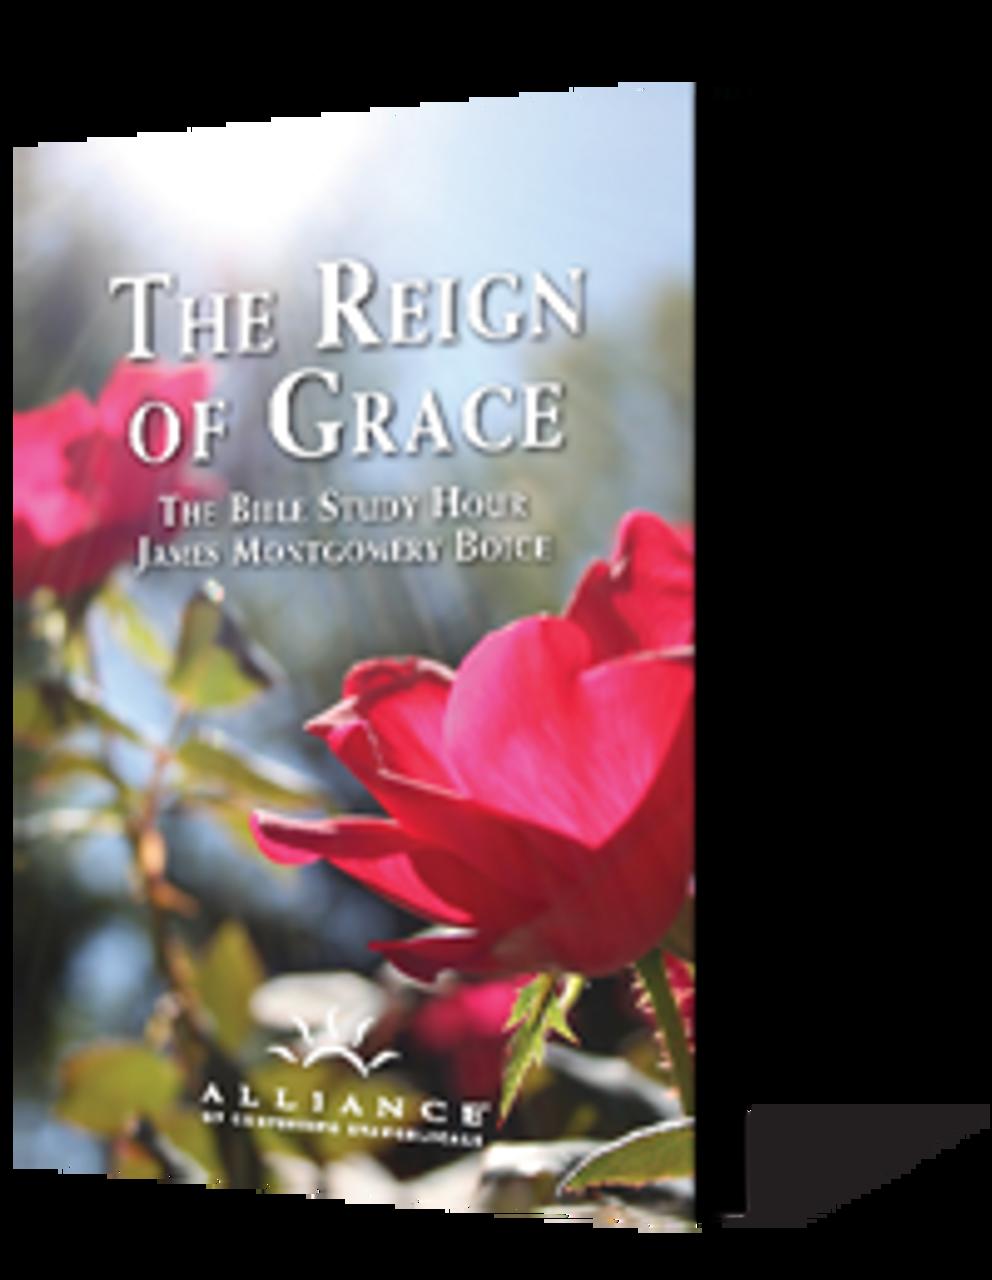 The Reign of Grace (CD Set)